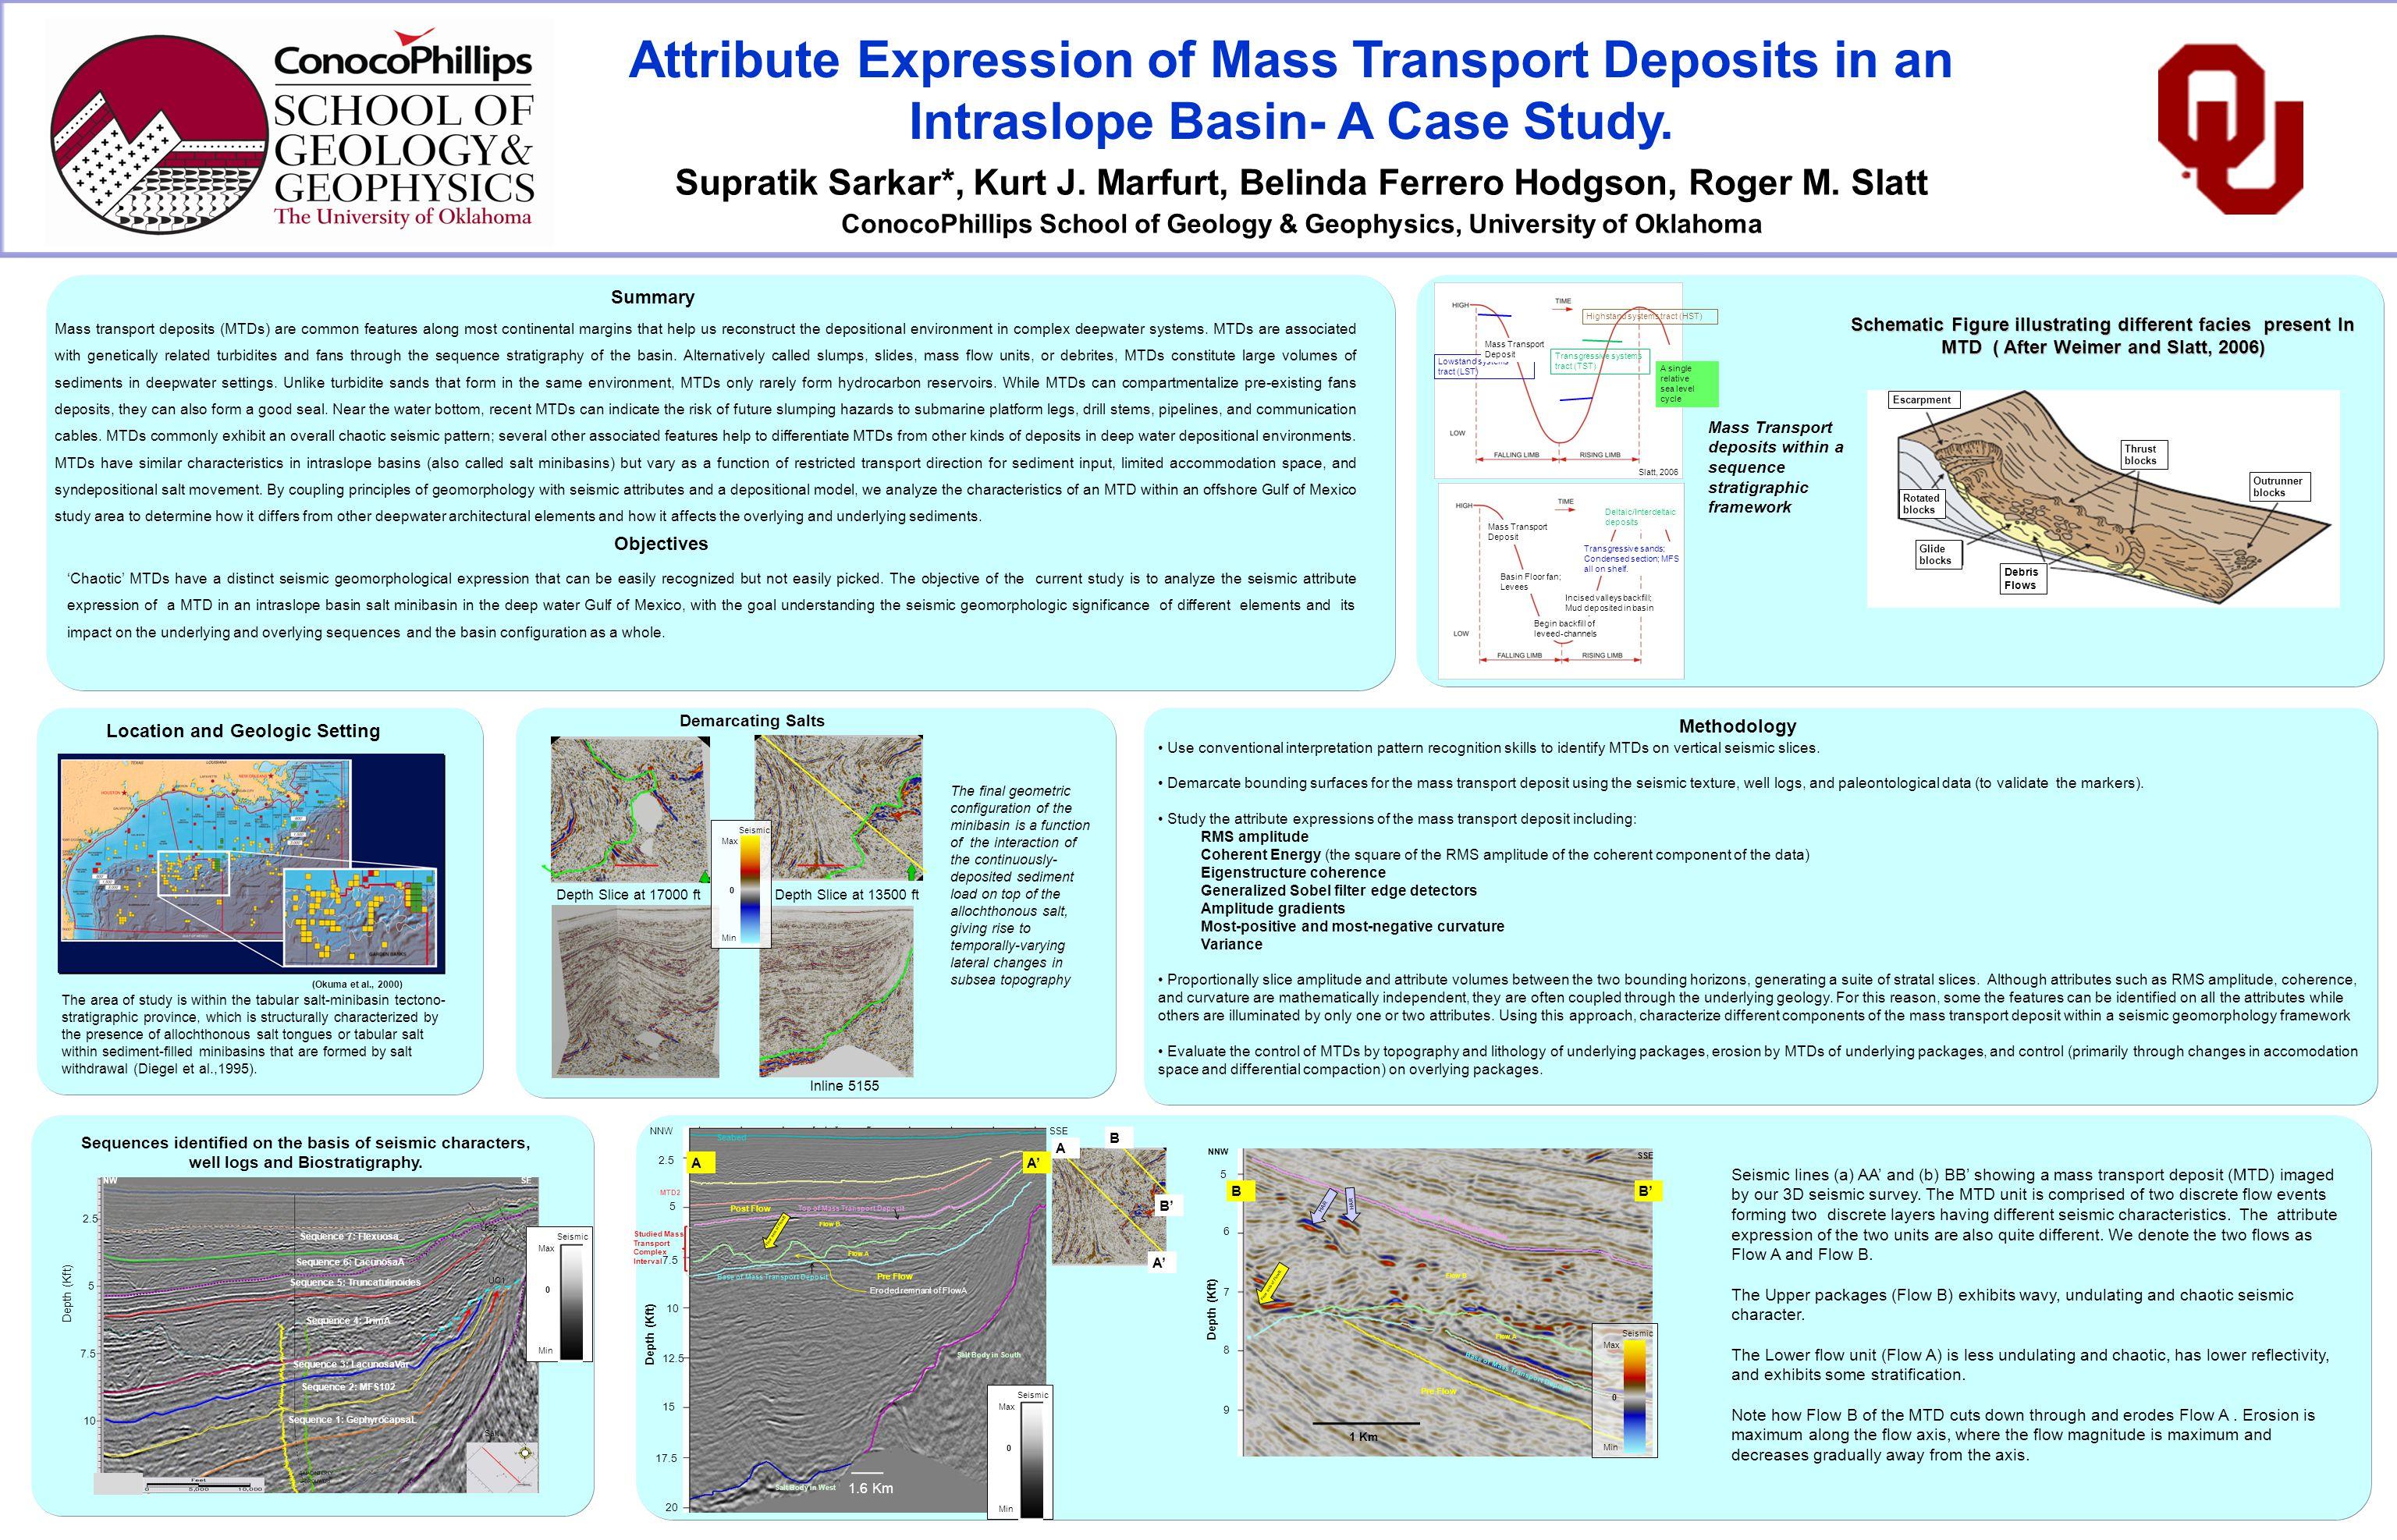 Attribute Expression of Mass Transport Deposits in an Intraslope Basin- A Case Study. Supratik Sarkar*, Kurt J. Marfurt, Belinda Ferrero Hodgson, Roge